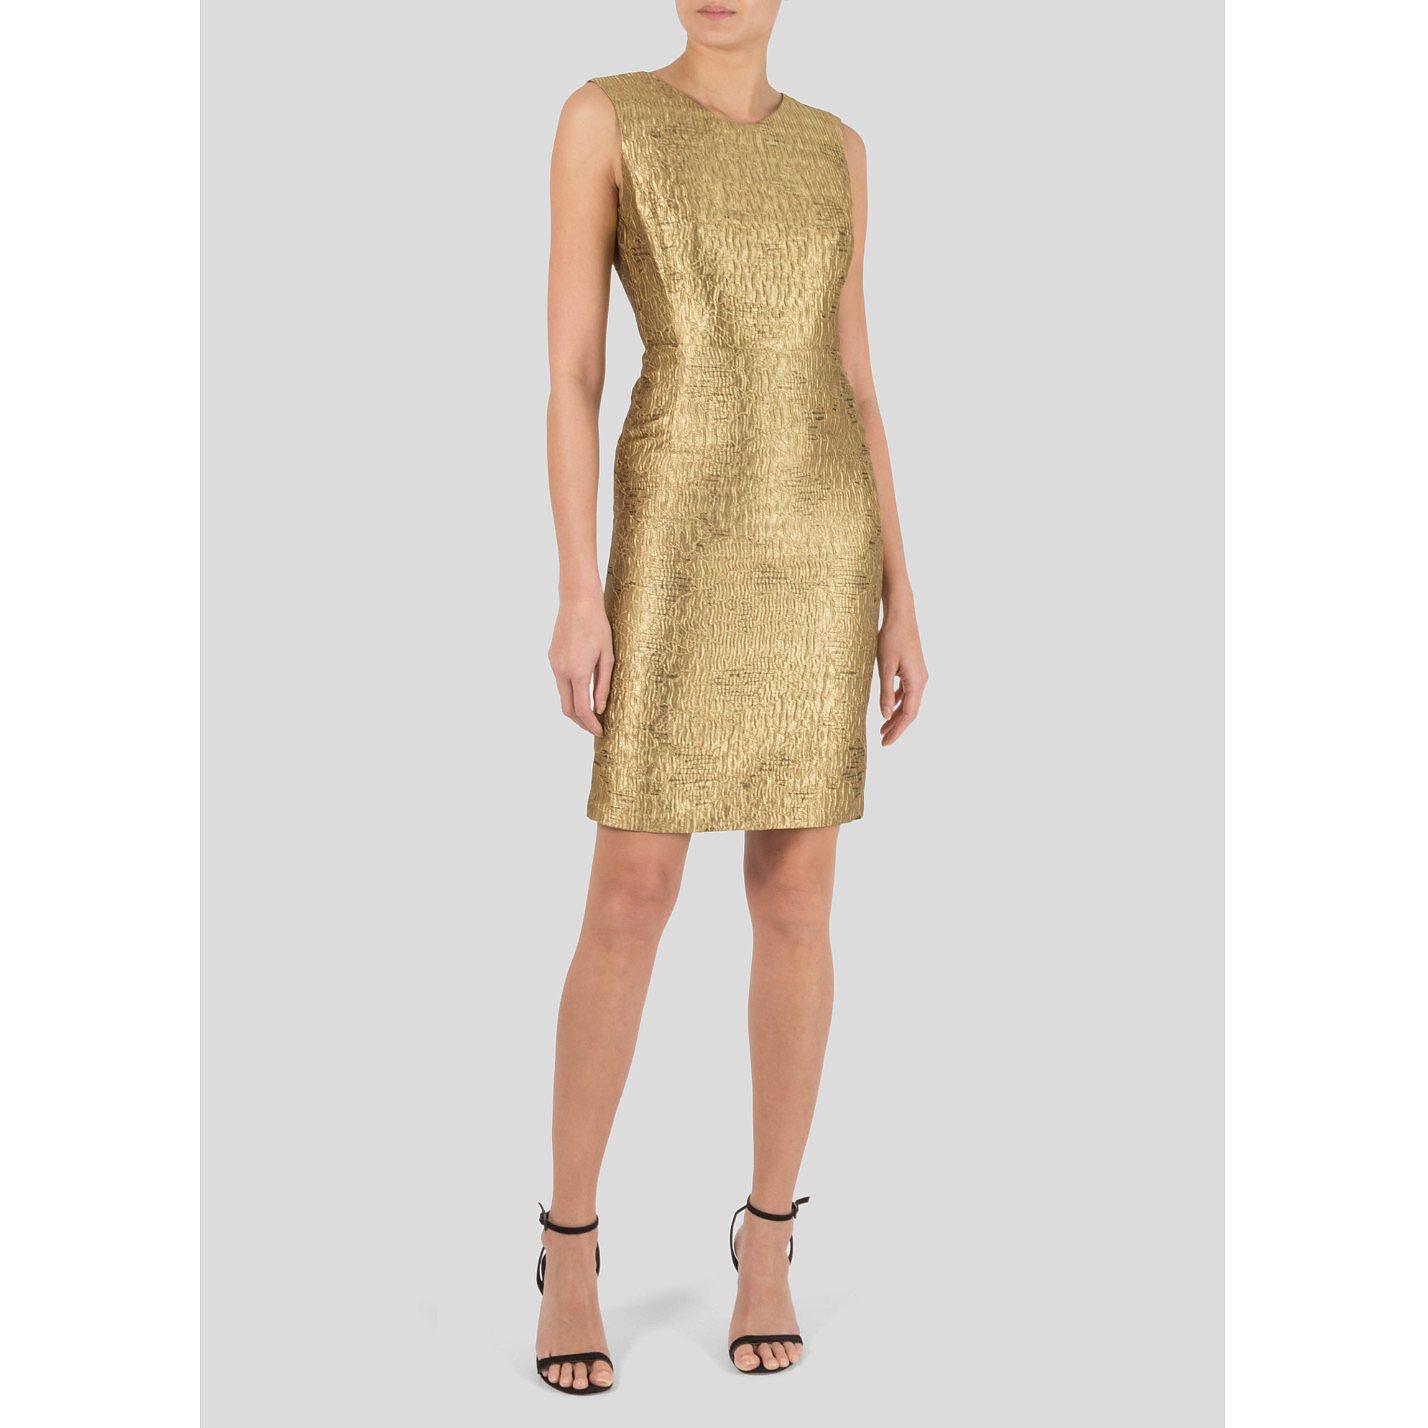 Oscar De La Renta Metallic Sleeveless Dress